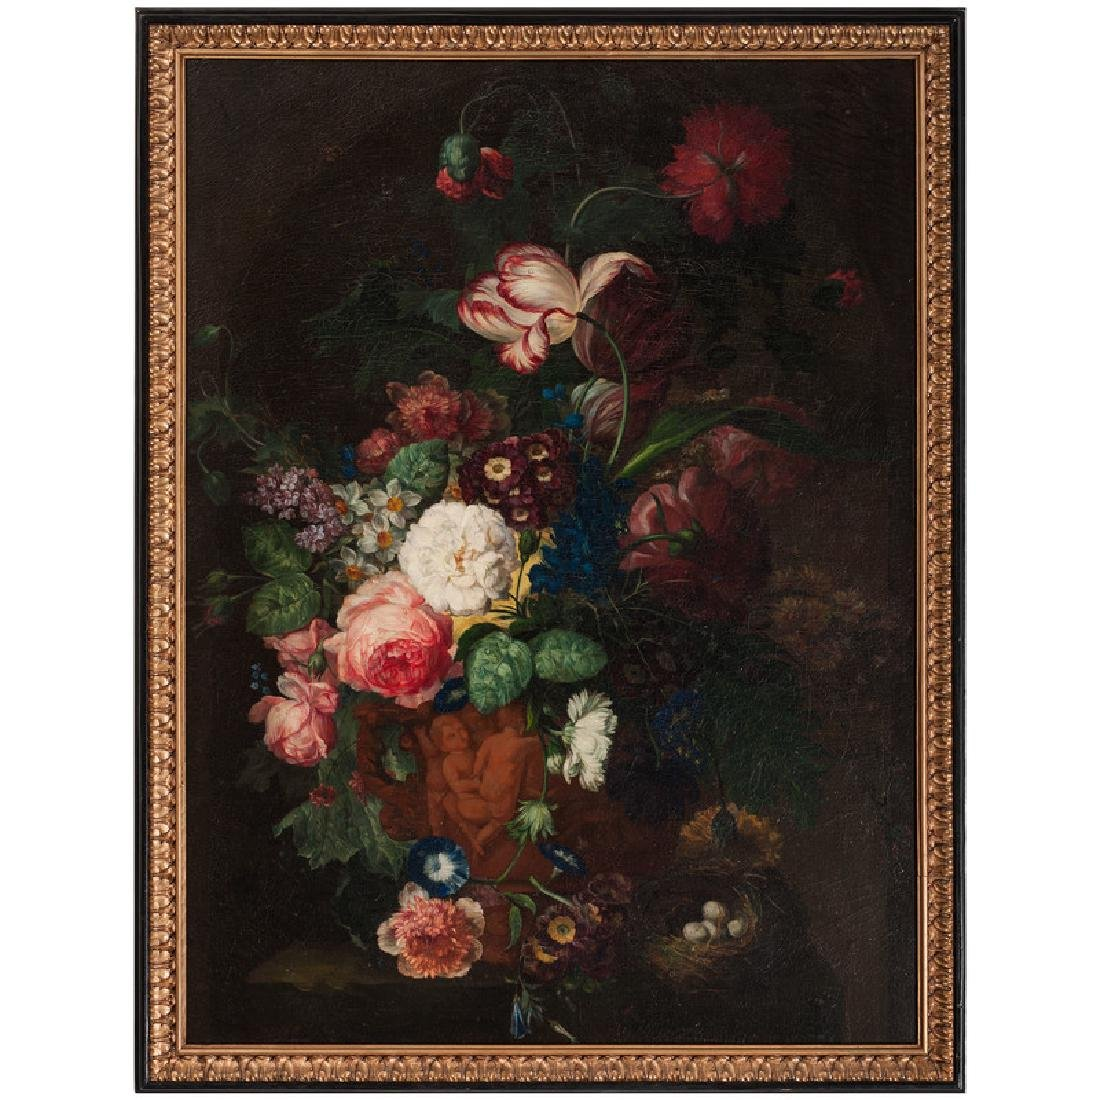 Still Life with Flower Bouquet and Bird Nest